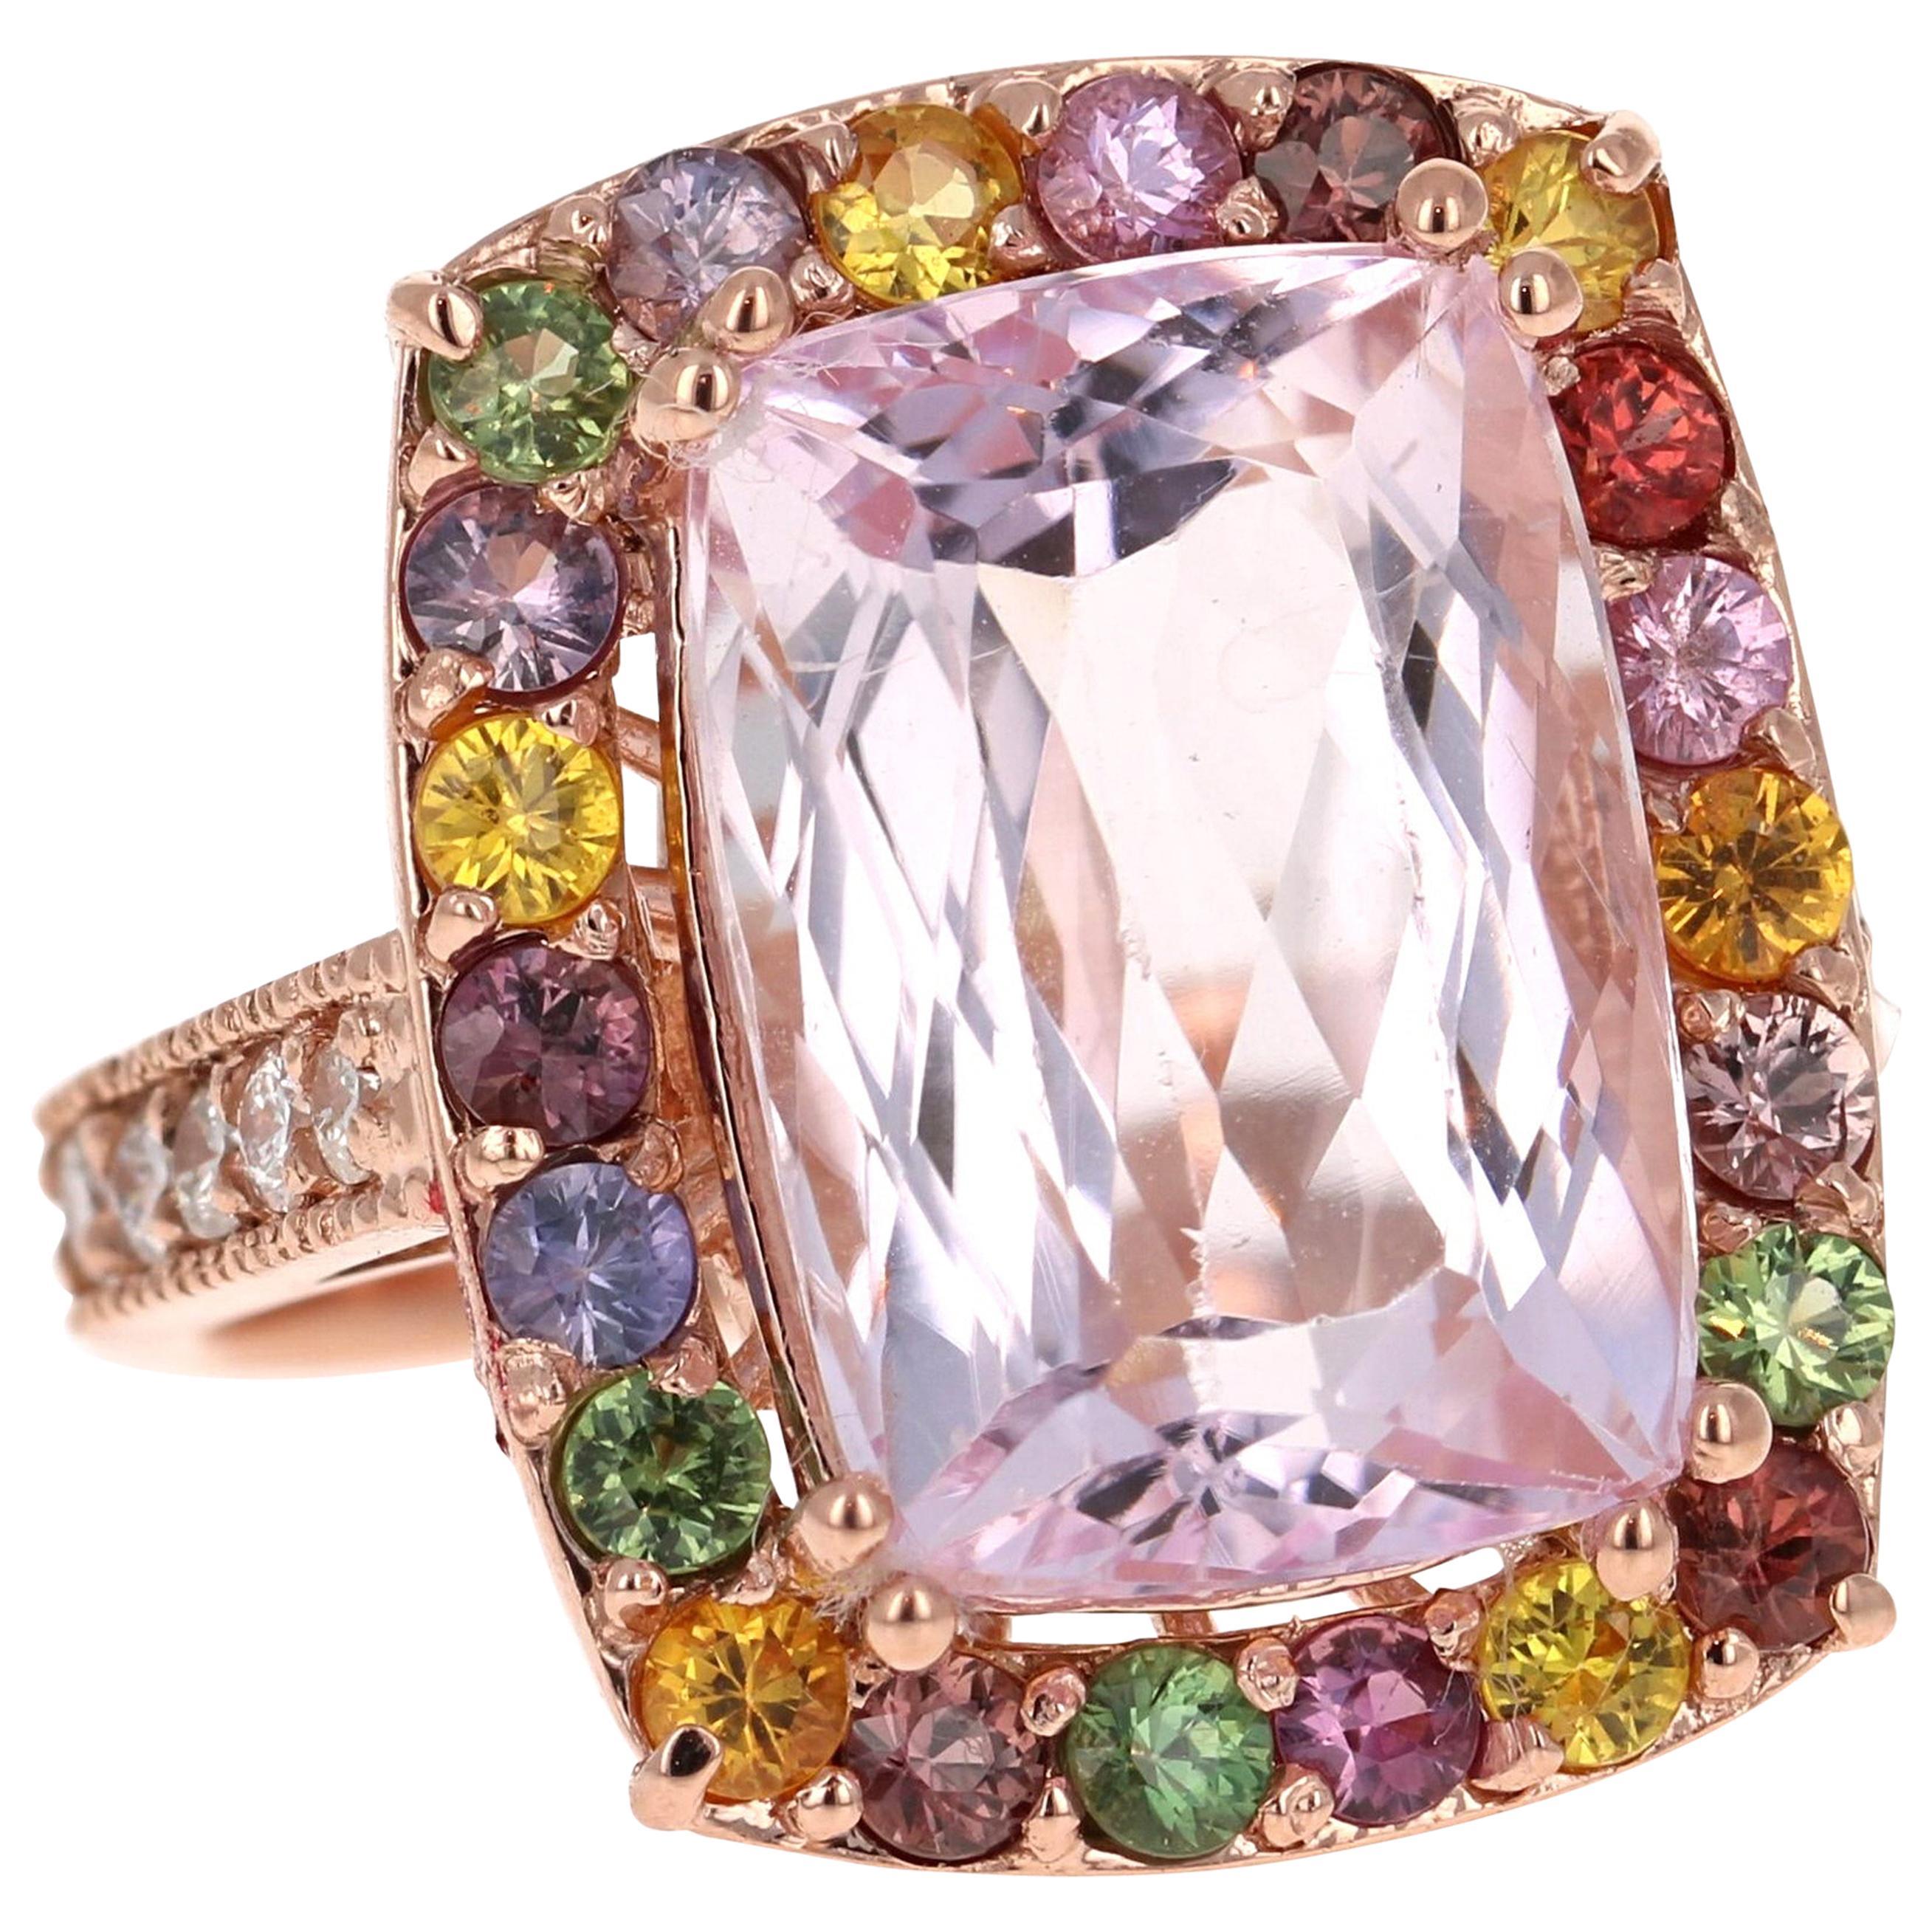 12.22 Carat Kunzite, Sapphire and Diamond 14 Karat Rose Gold Cocktail Ring